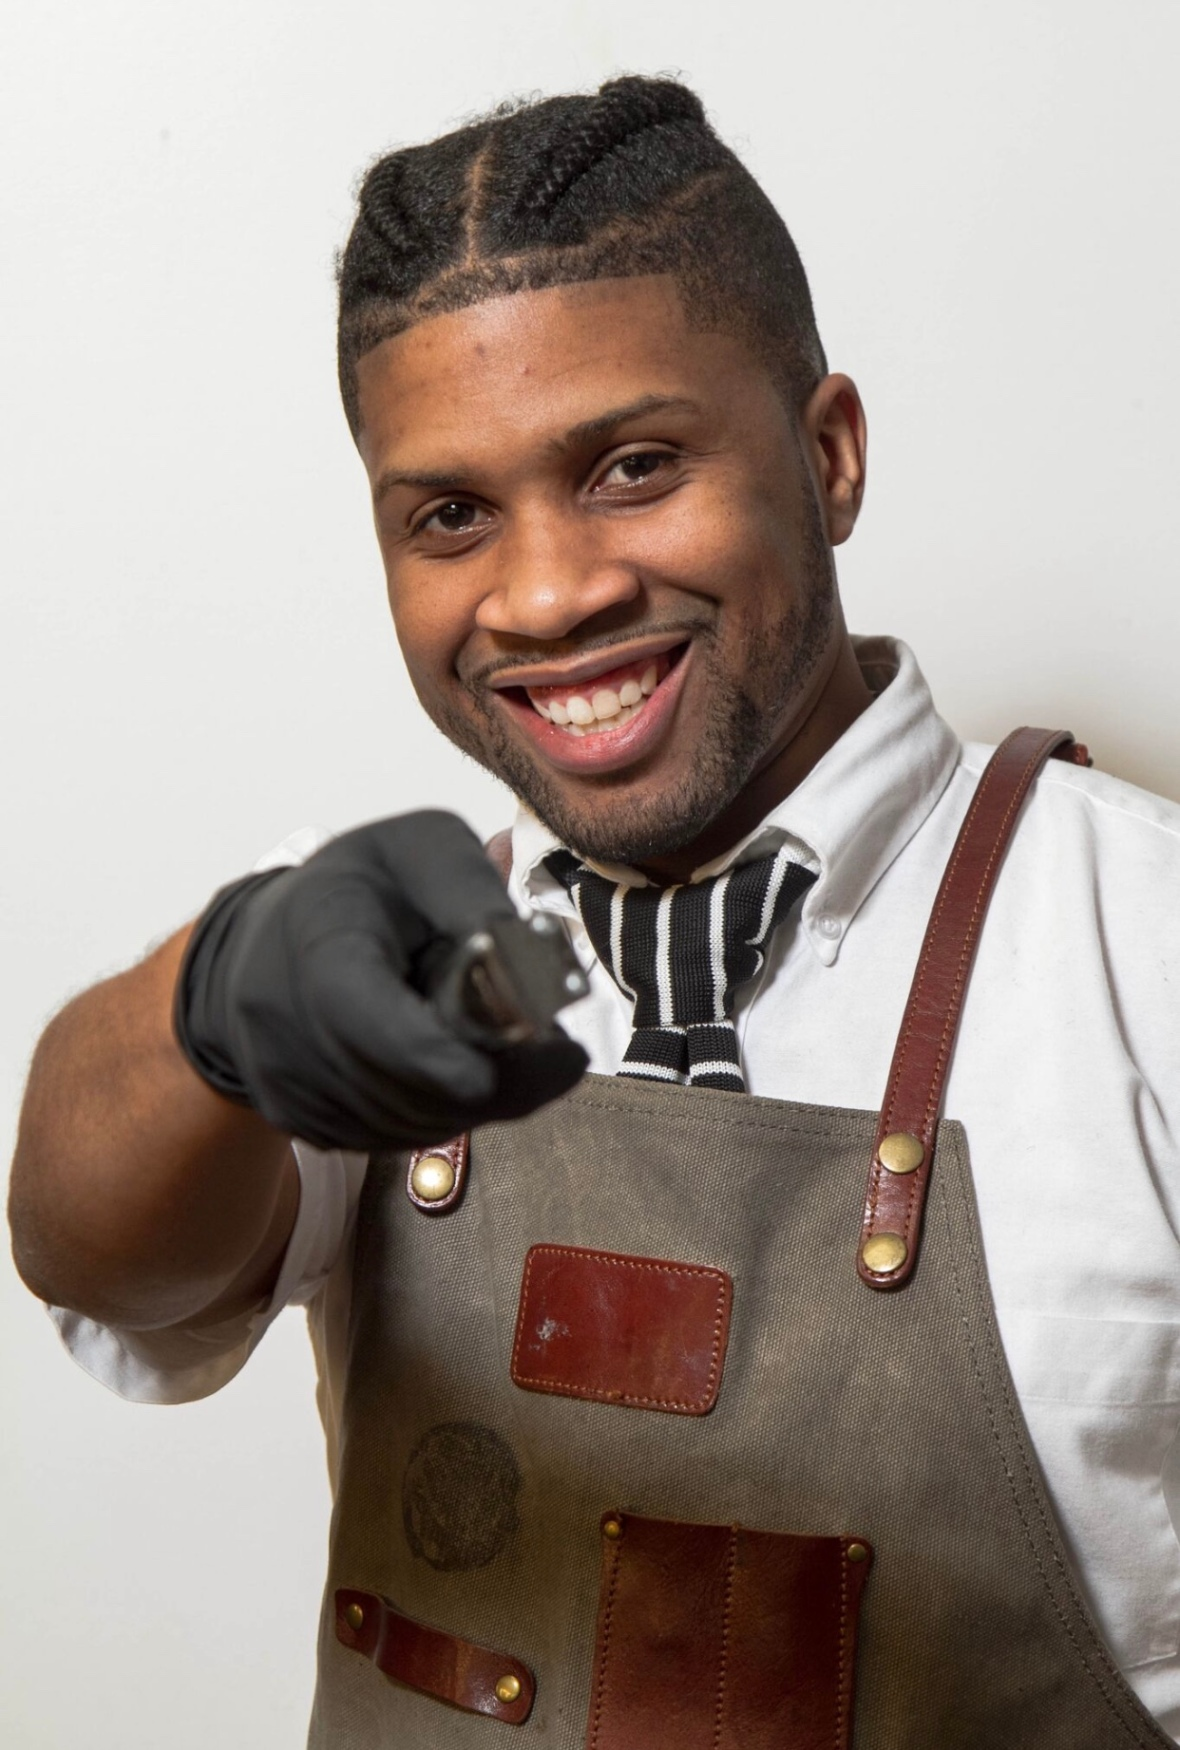 Meet the Barbers – DRE & CRAIG'S VIP CUTS